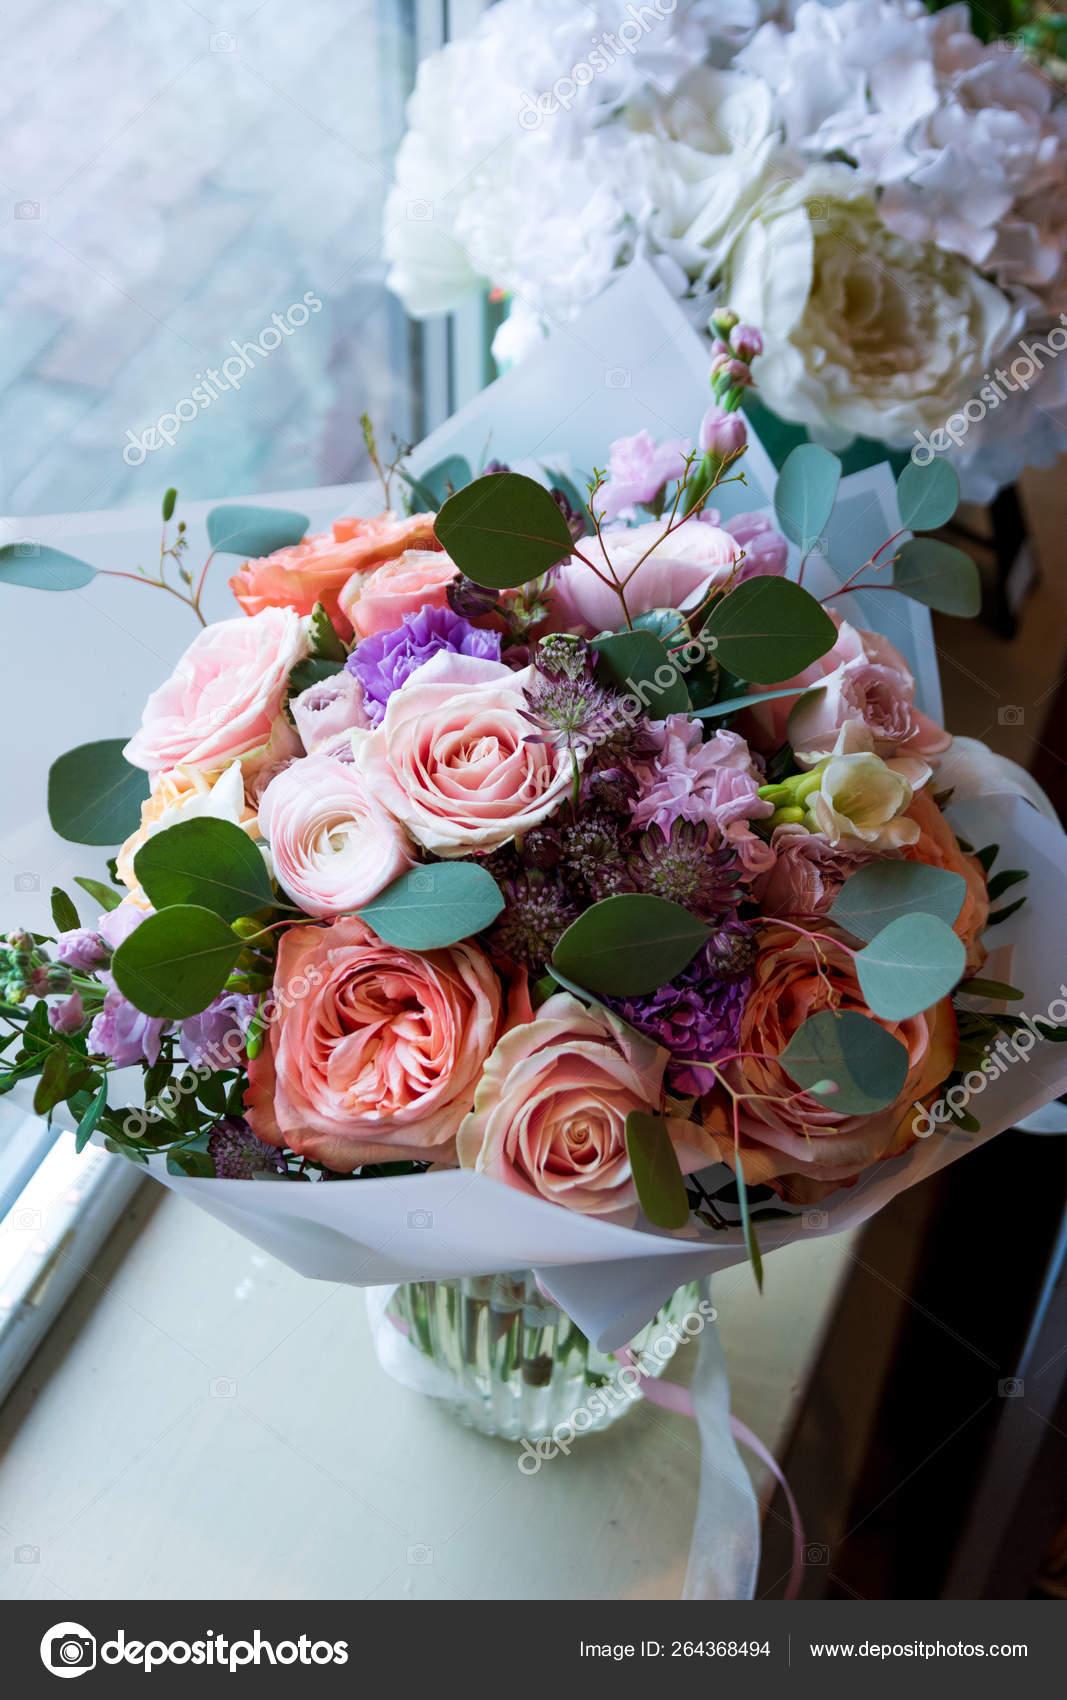 Bouquet Flowers Wedding Salon Roses Anemone Tulip Ranunculus Sunflower Garden Stock Photo C Plan905 264368494